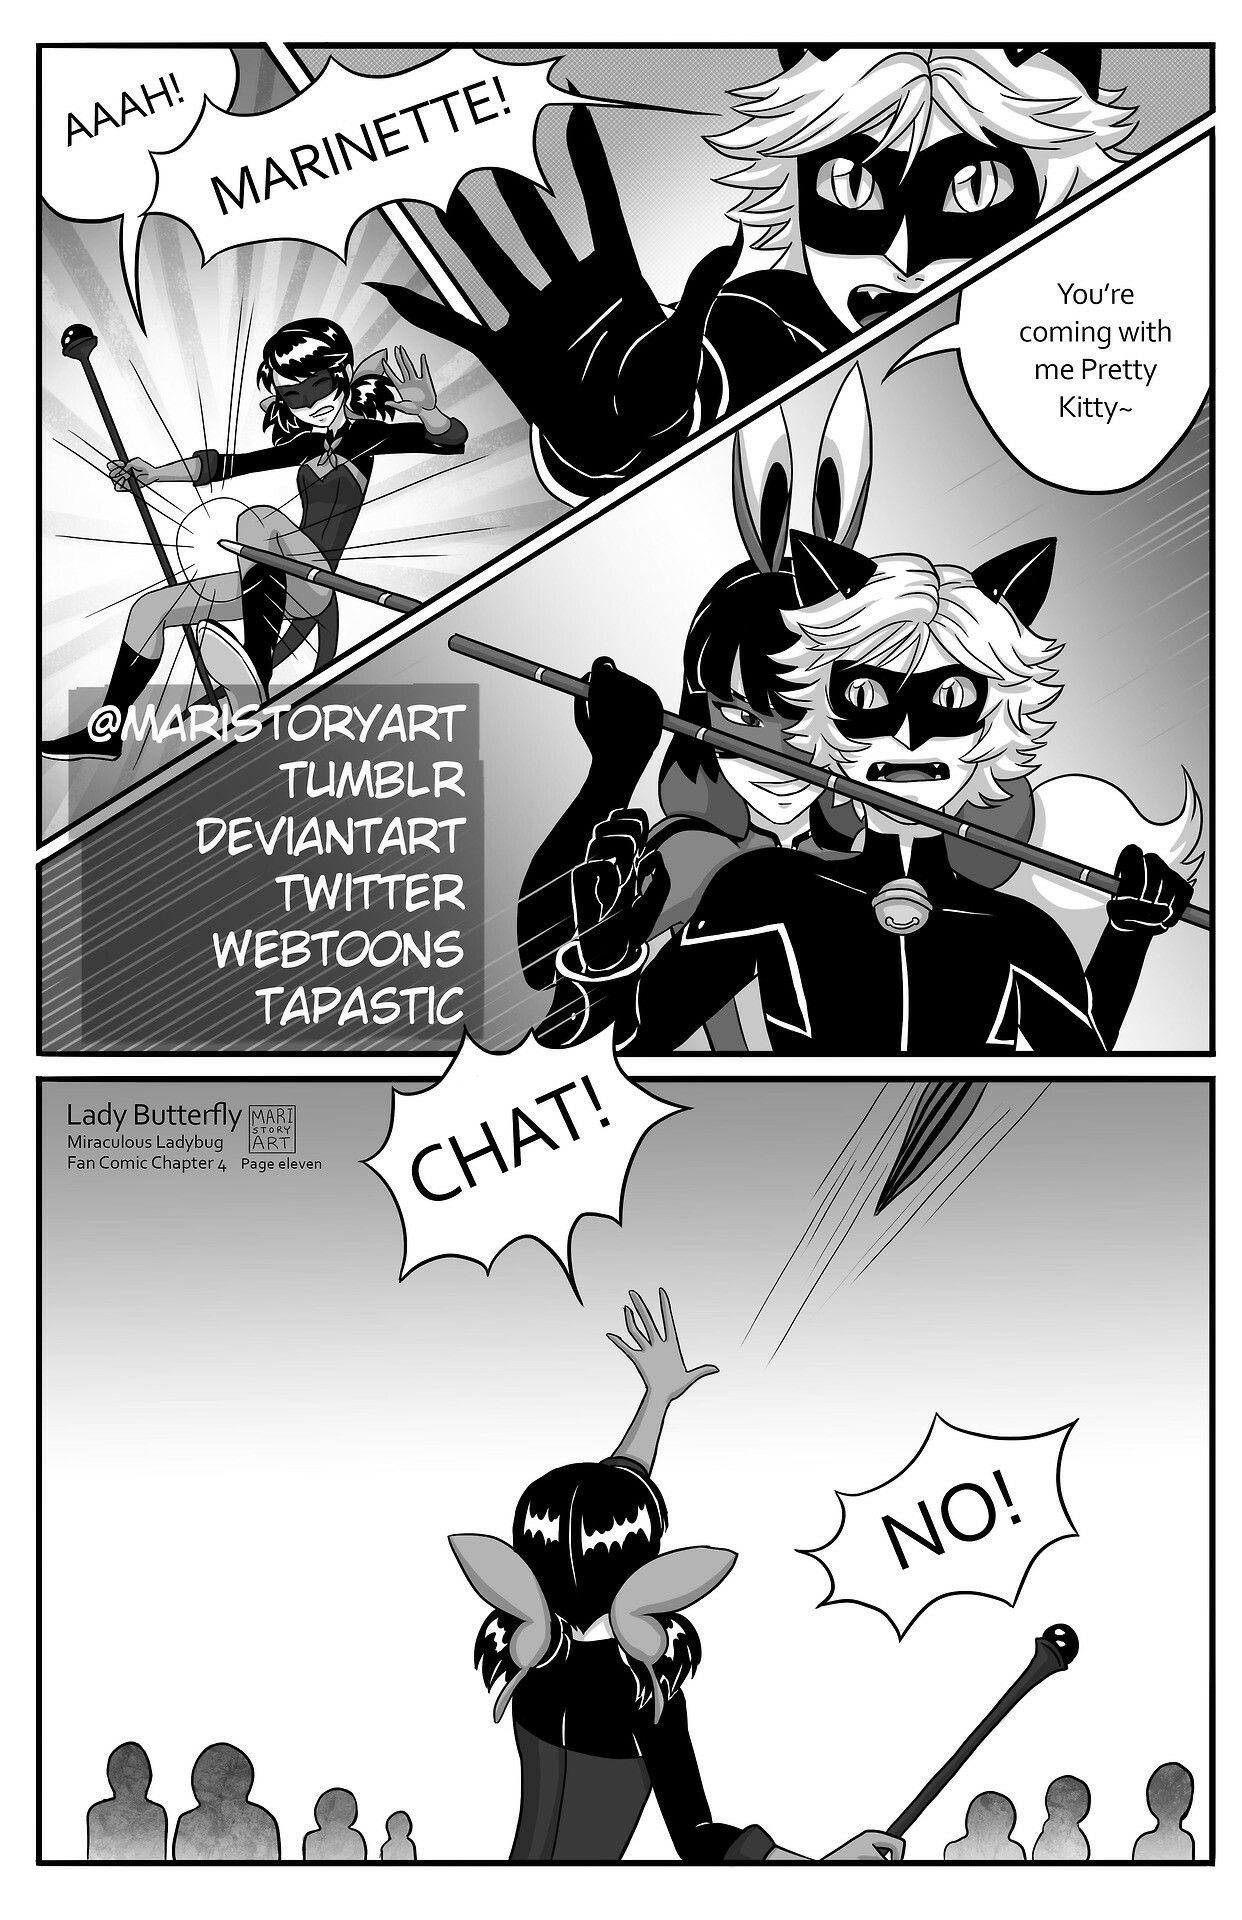 City of lies chapter 4 page 11 by Maristoryart | Marichat